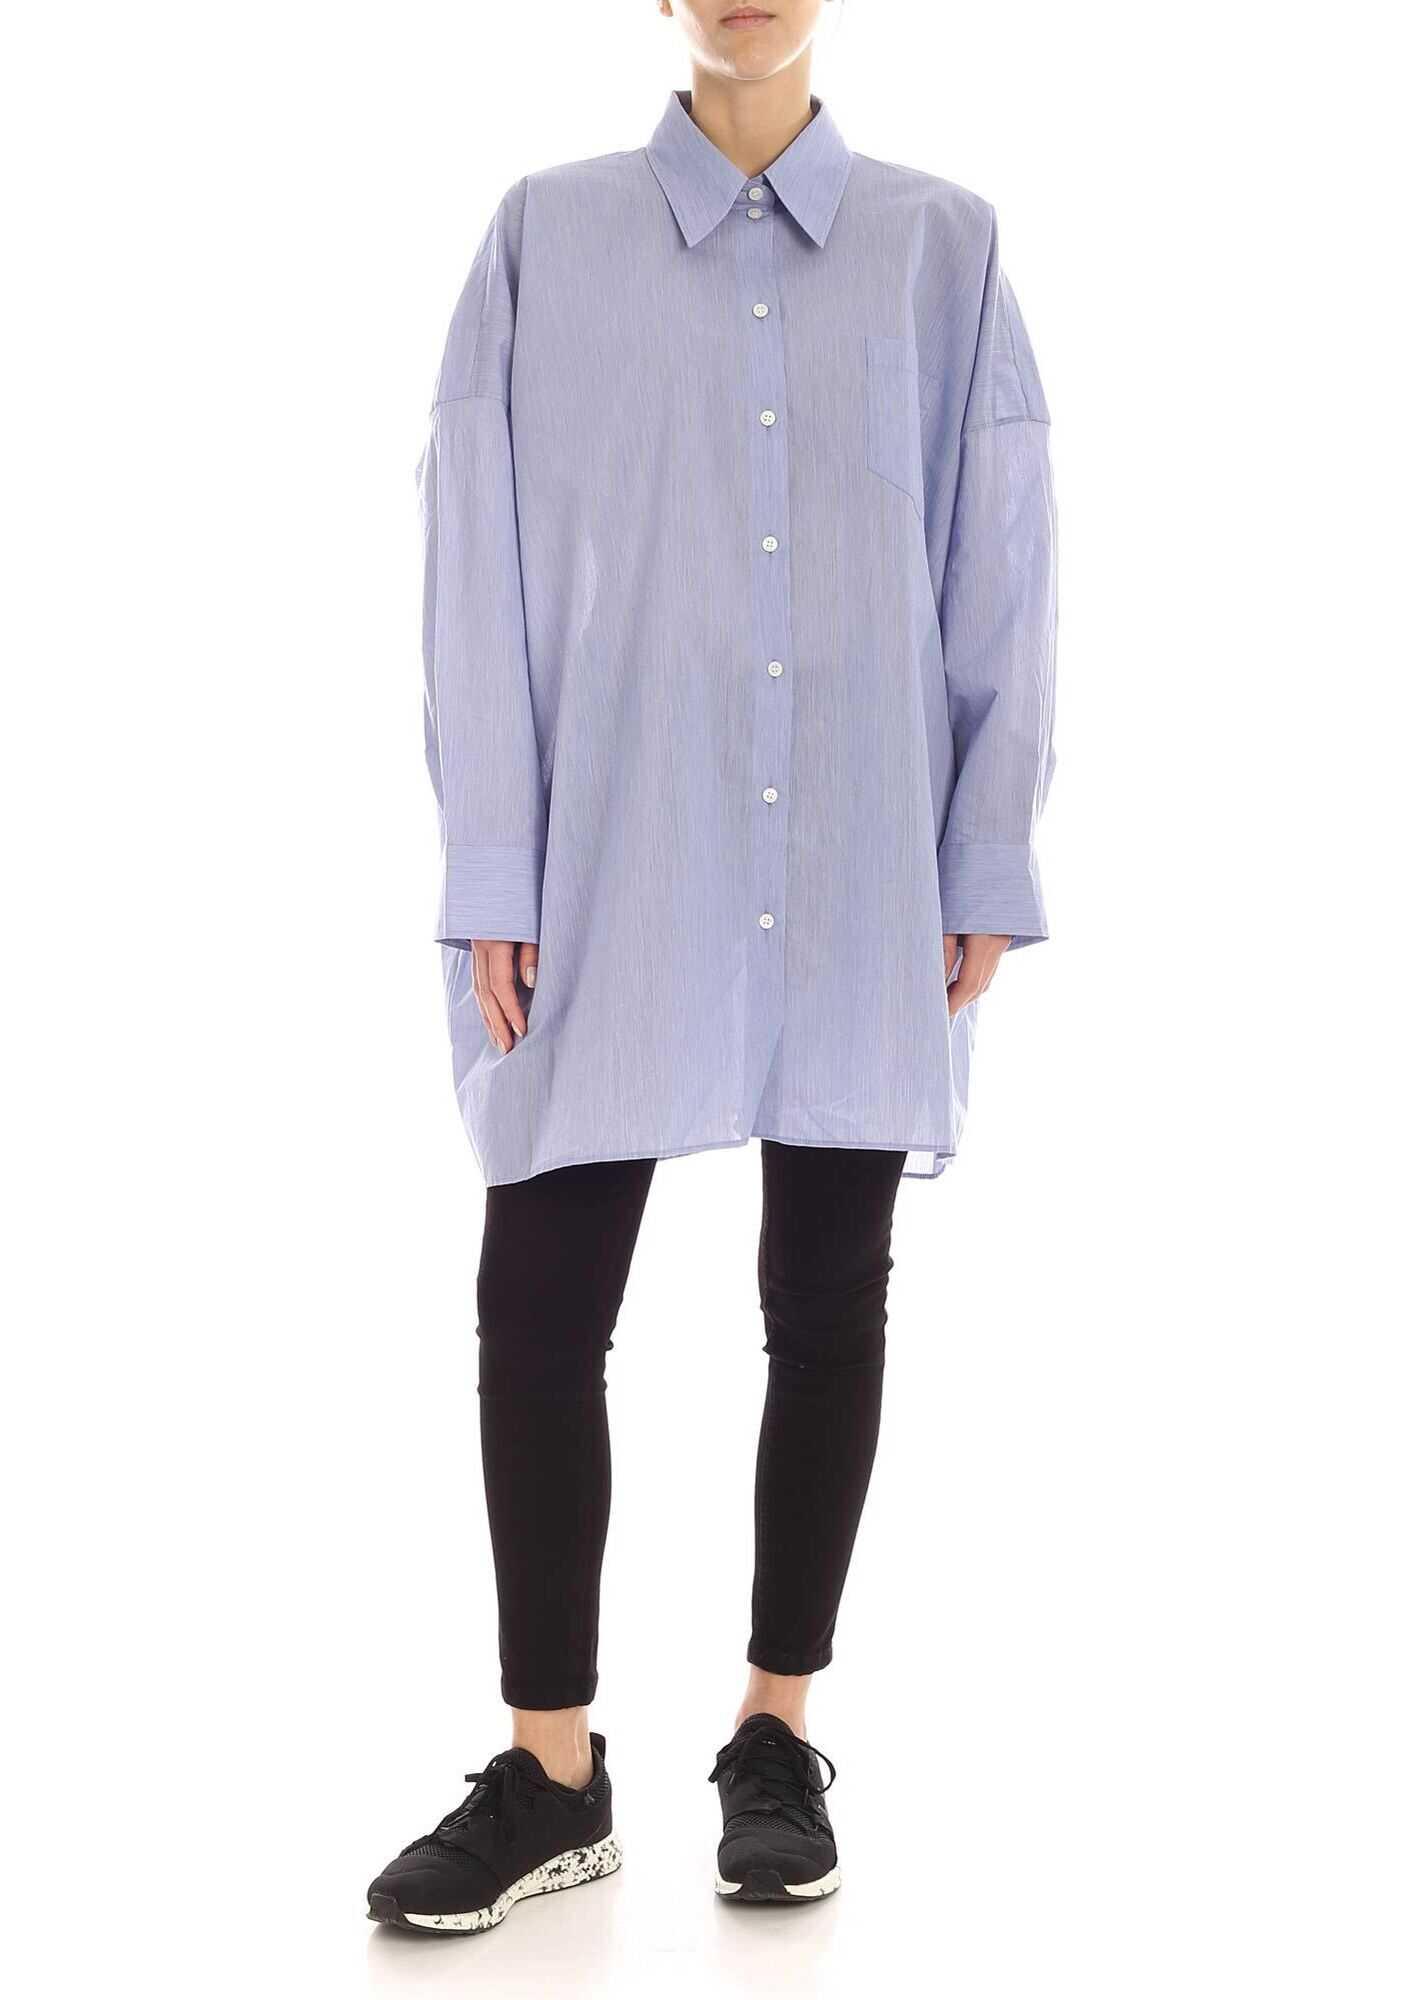 Acne Studios Oversize Shirt In Melange Blue Blue